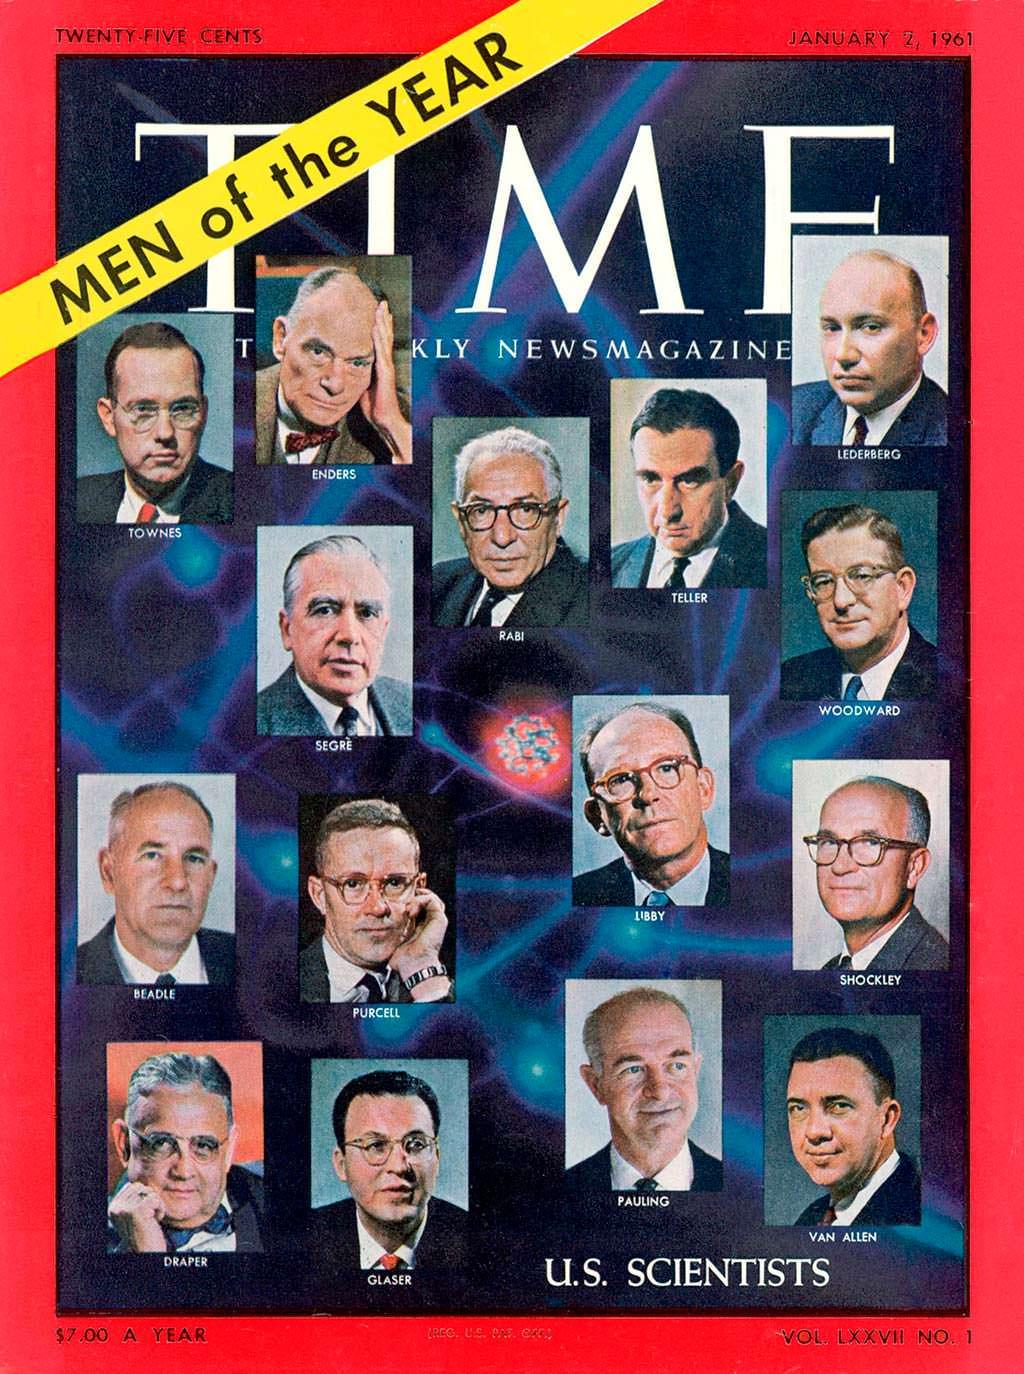 1960 год. Учёные США на обложке Time